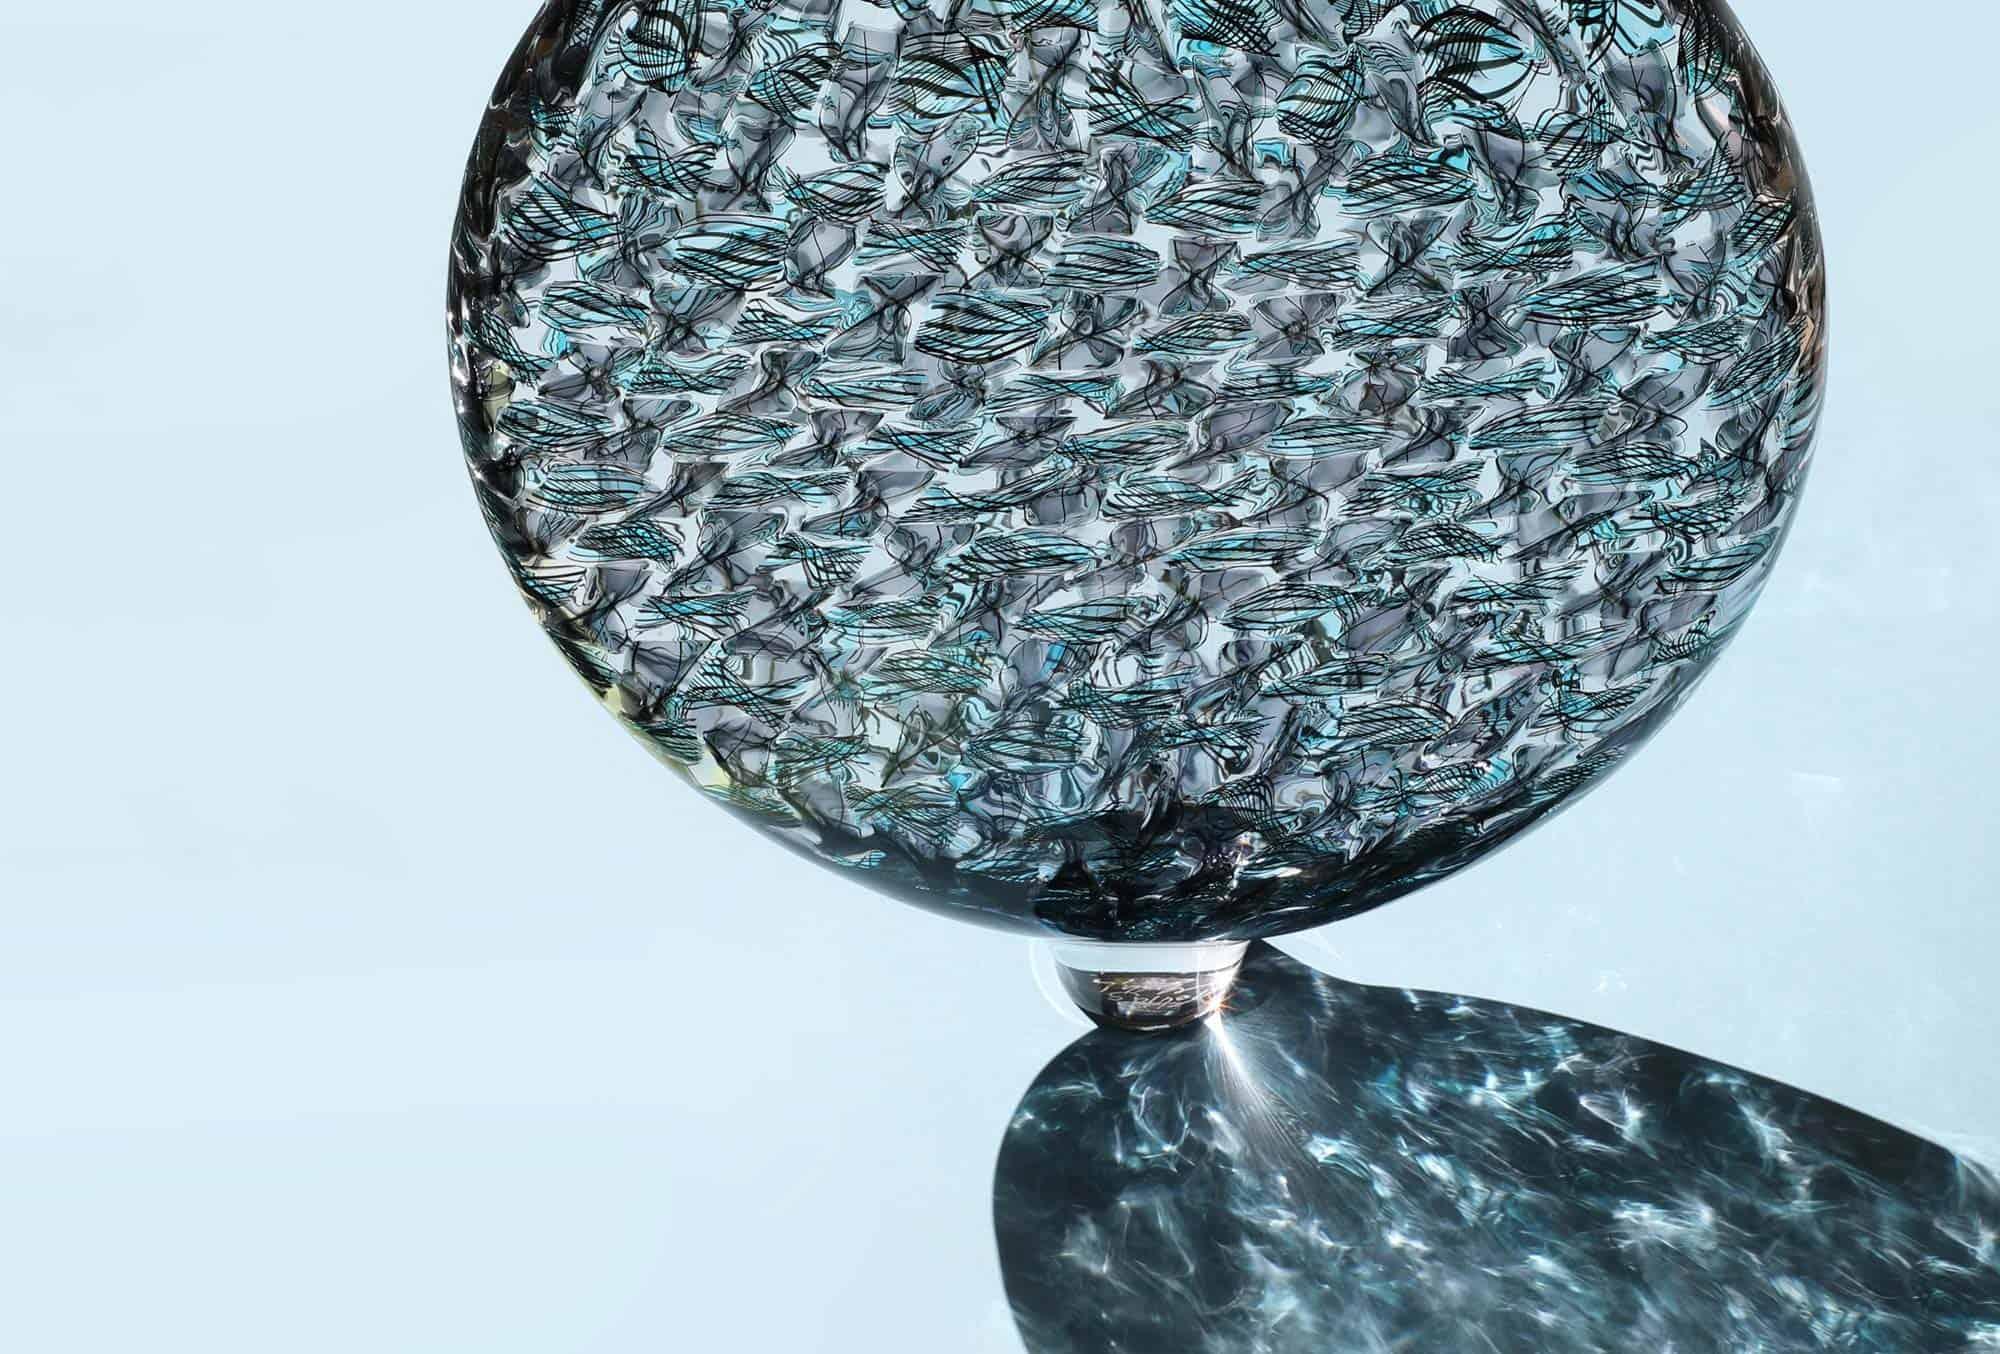 Tobias_Mohl_vessel_glass